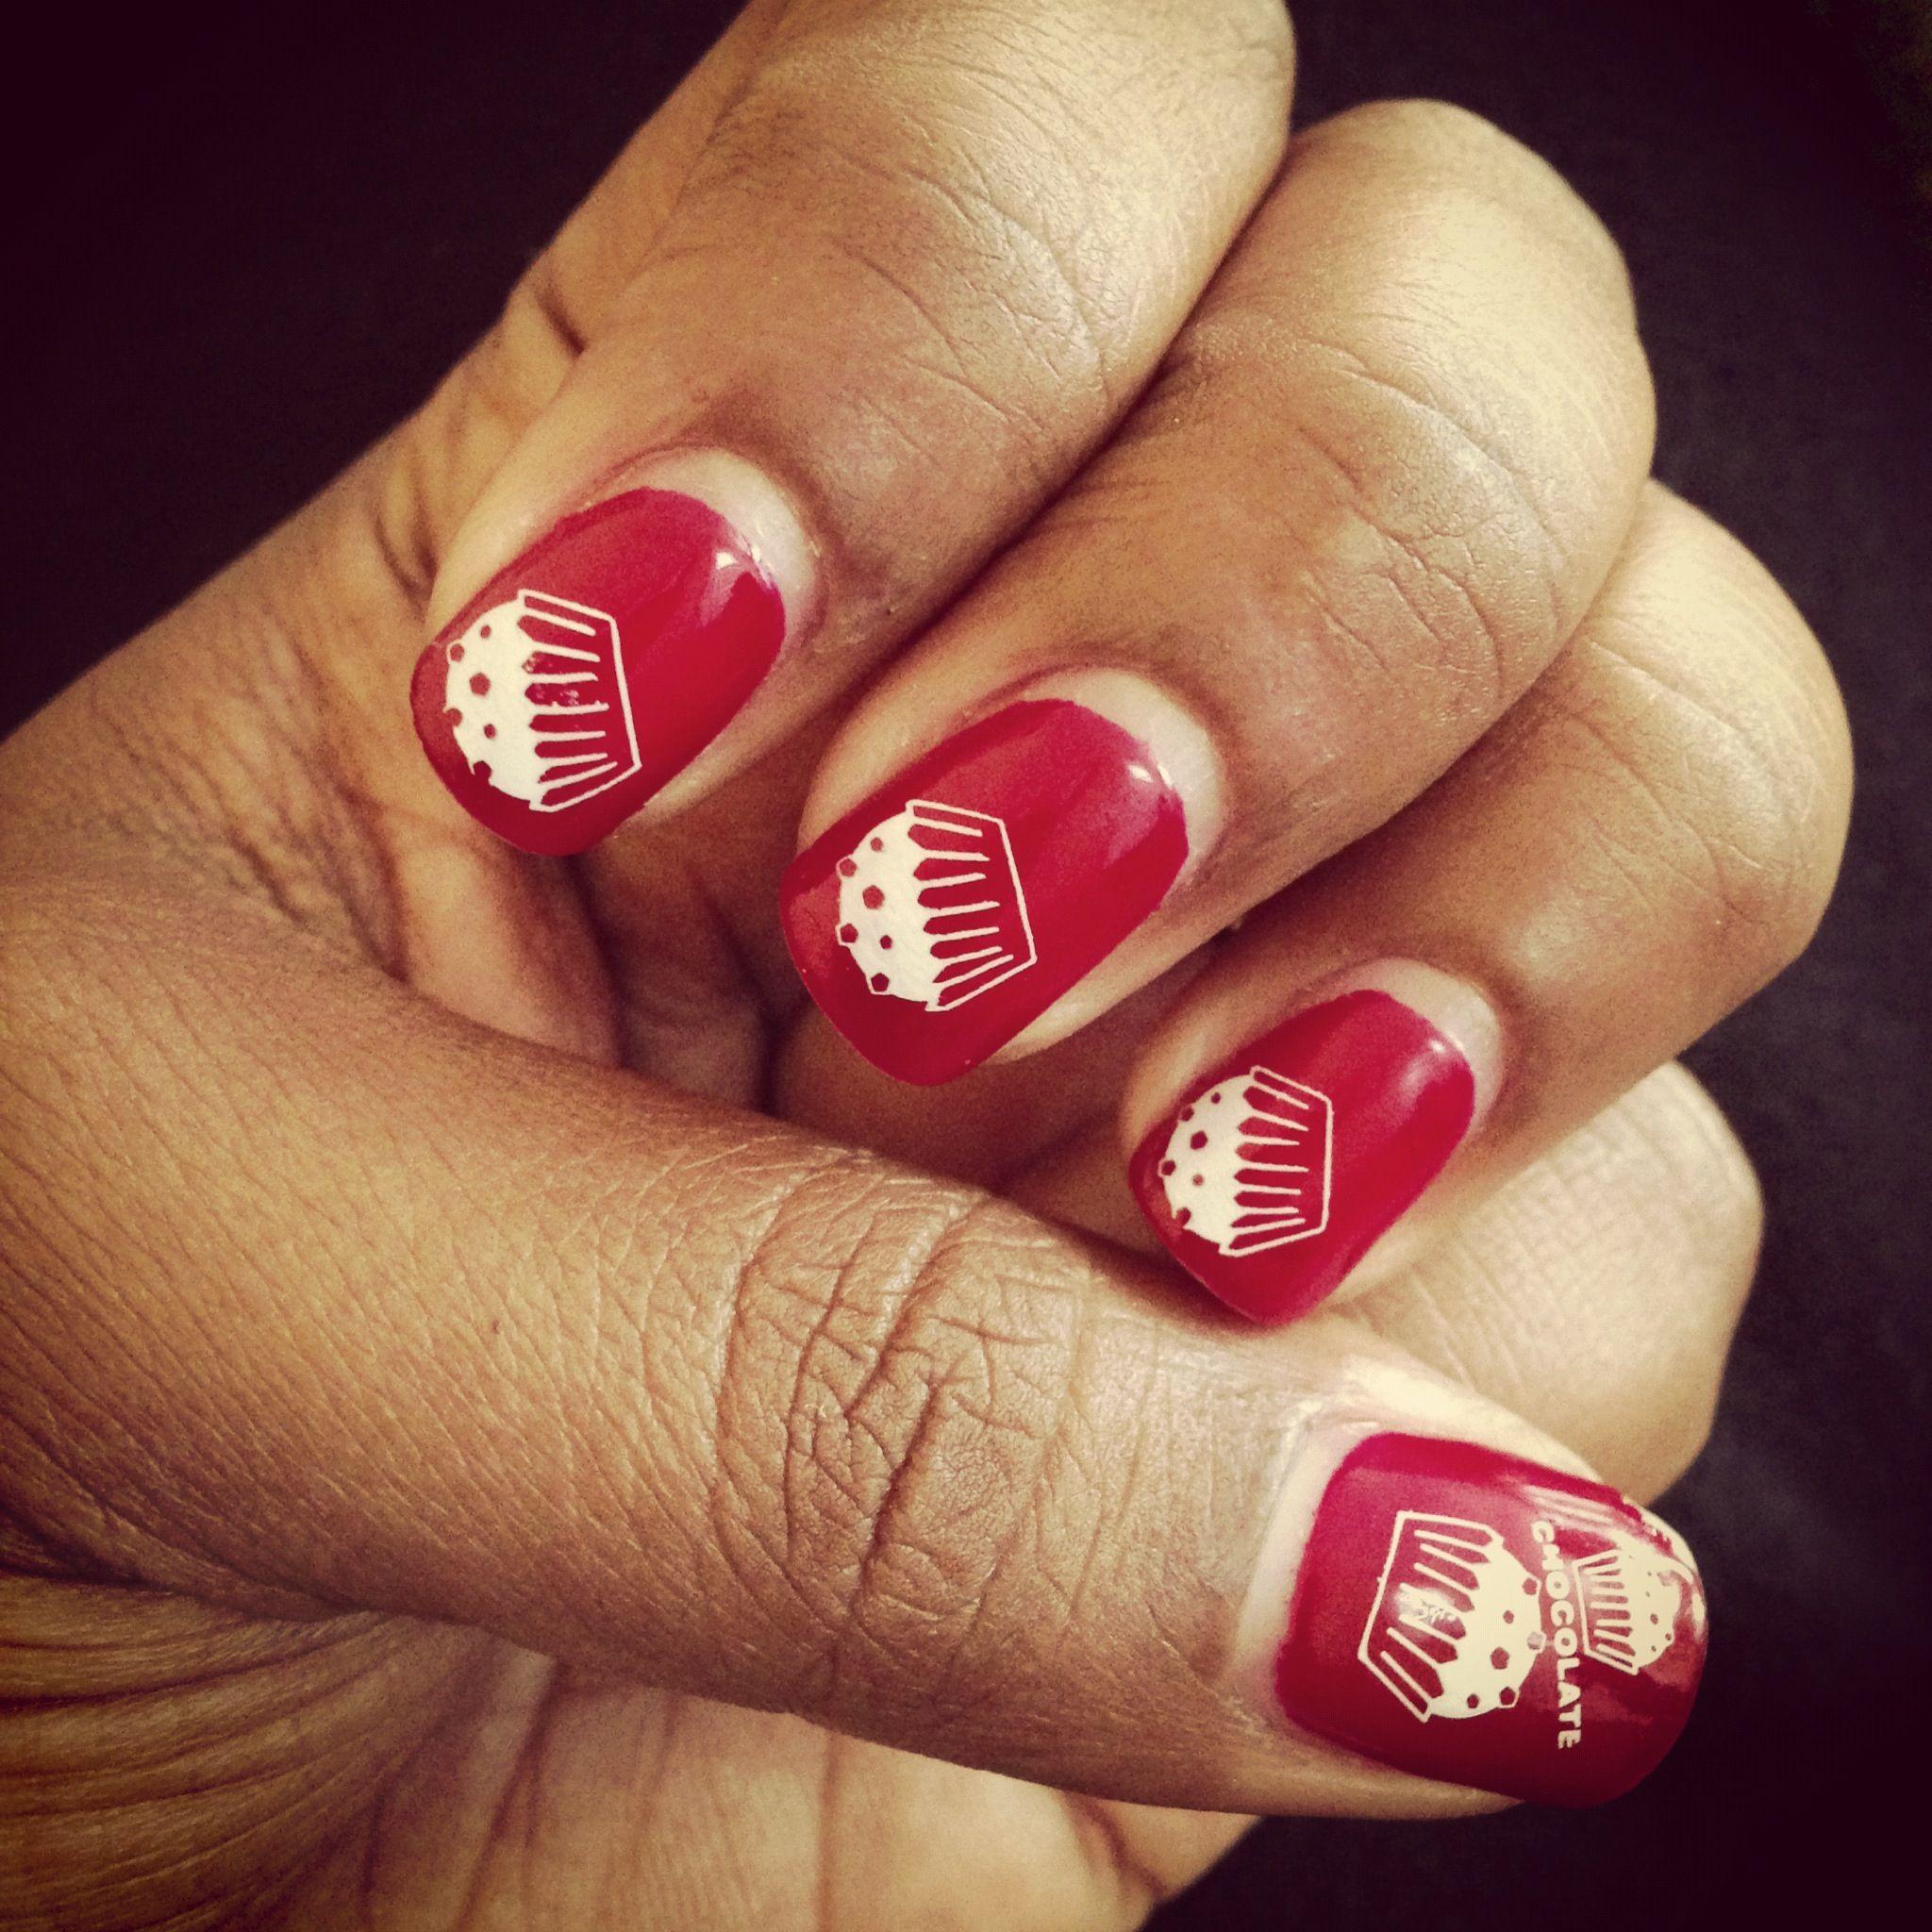 Pin by Ariana Herrera on Wow nails   Wow nails, Nails